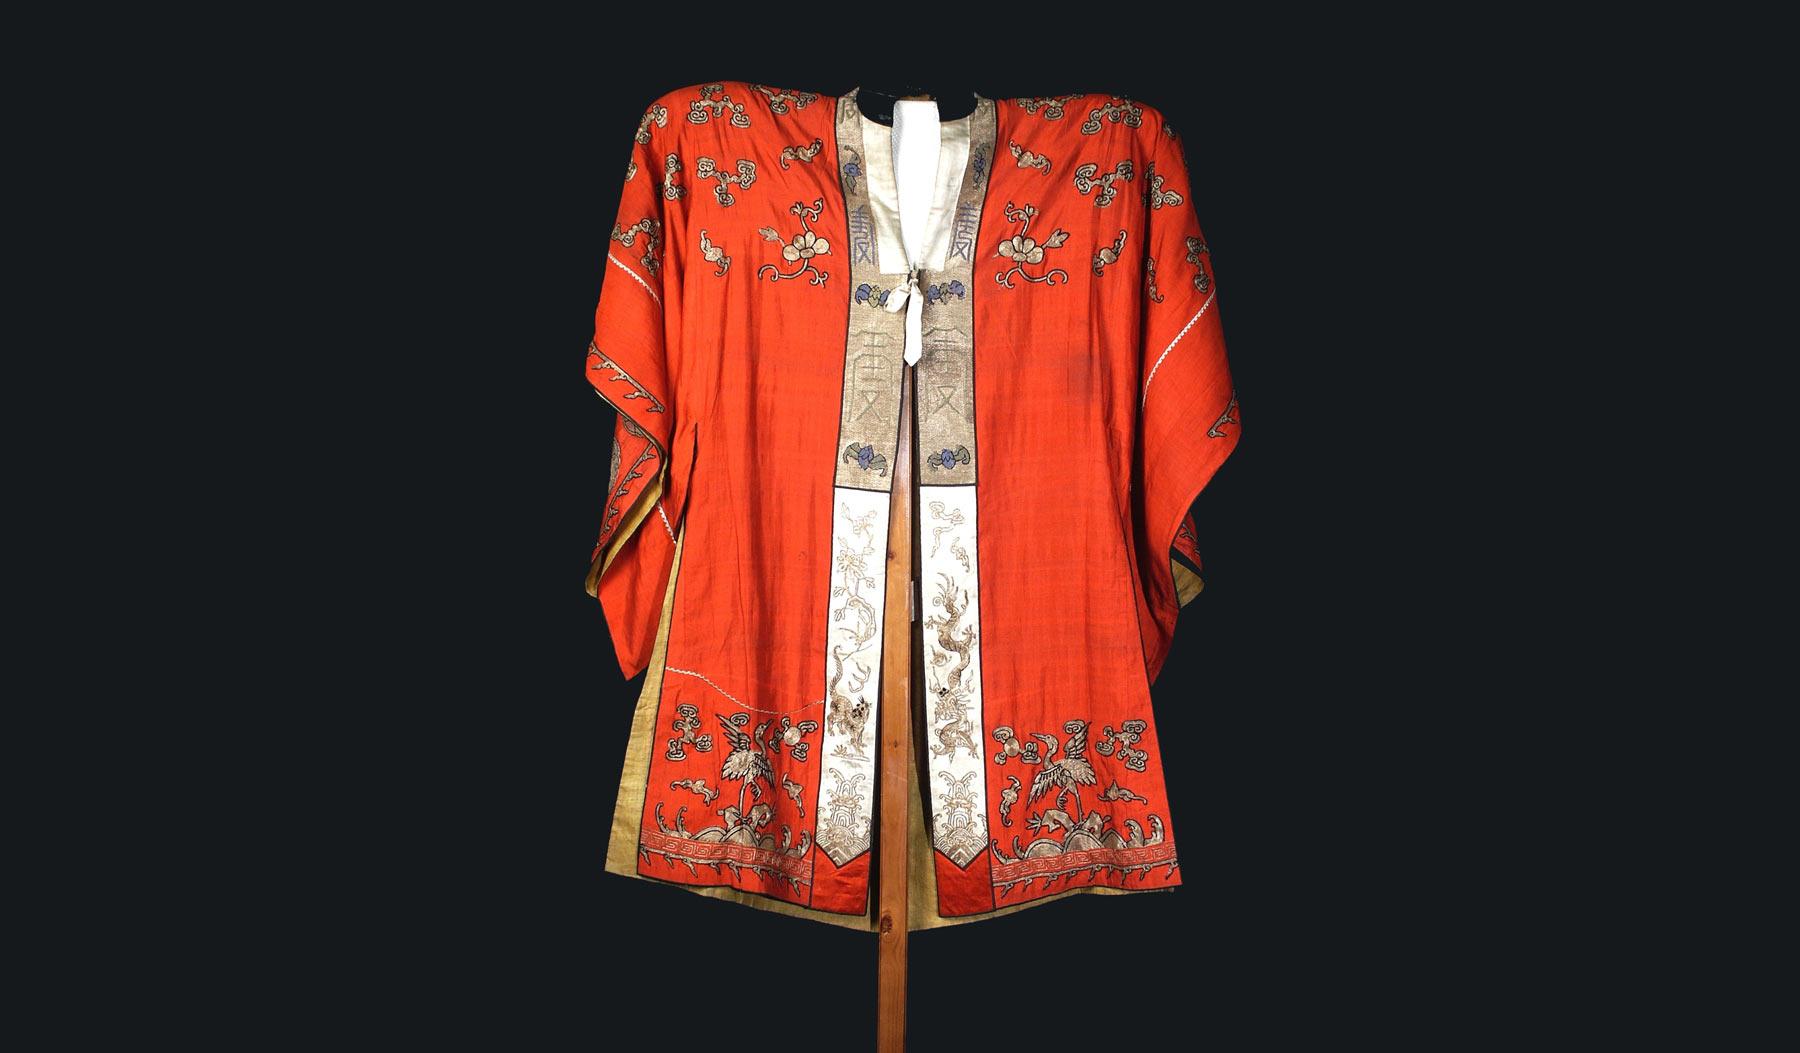 Parma: dalla Cina al Congo, le mode nel mondo in una mostra del Museo d'Arte Cinese ed Etnografico